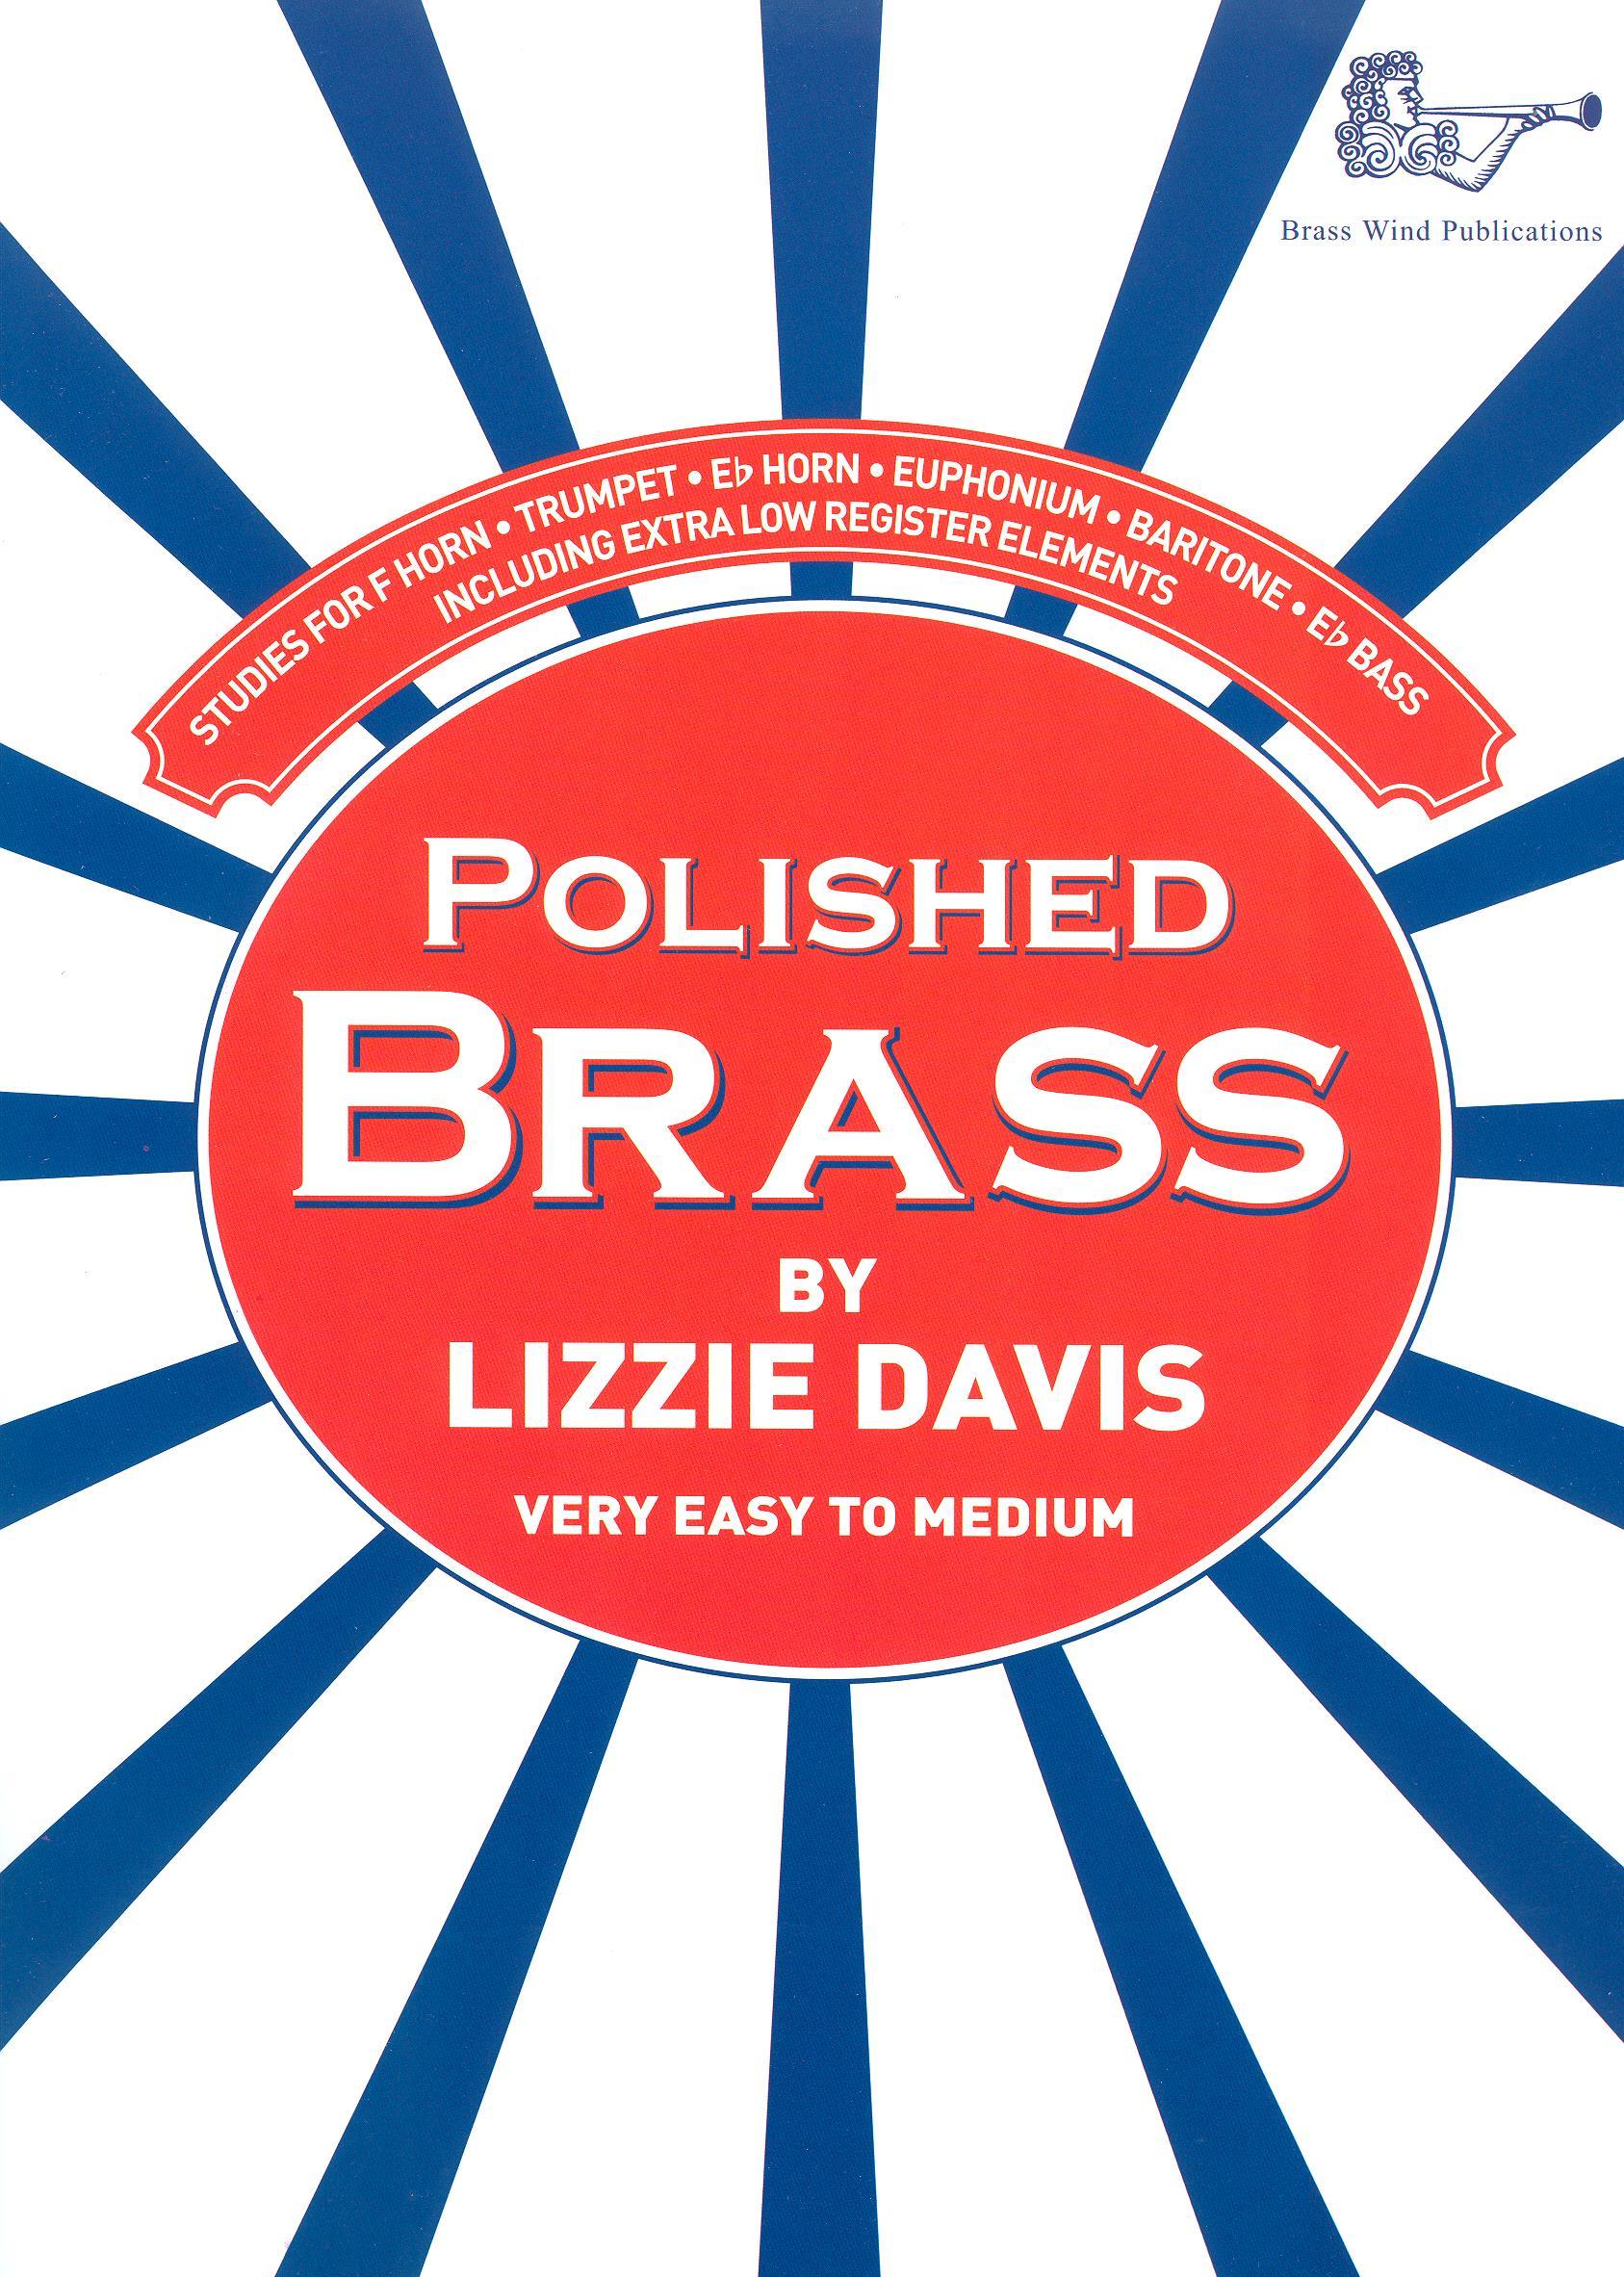 Polished Brass Treble Clef